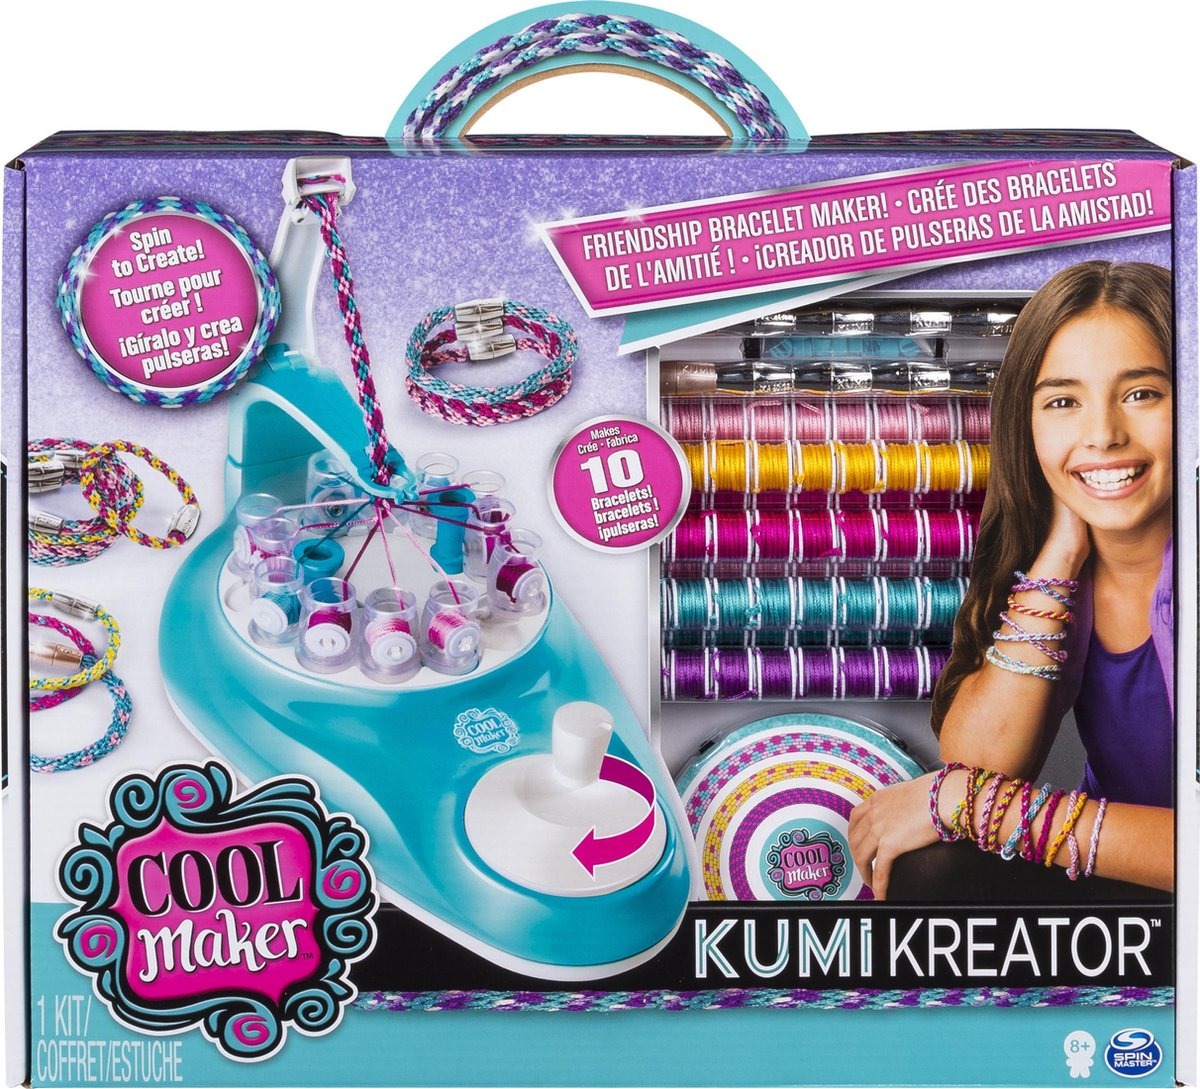 Kumi Kreator Studio